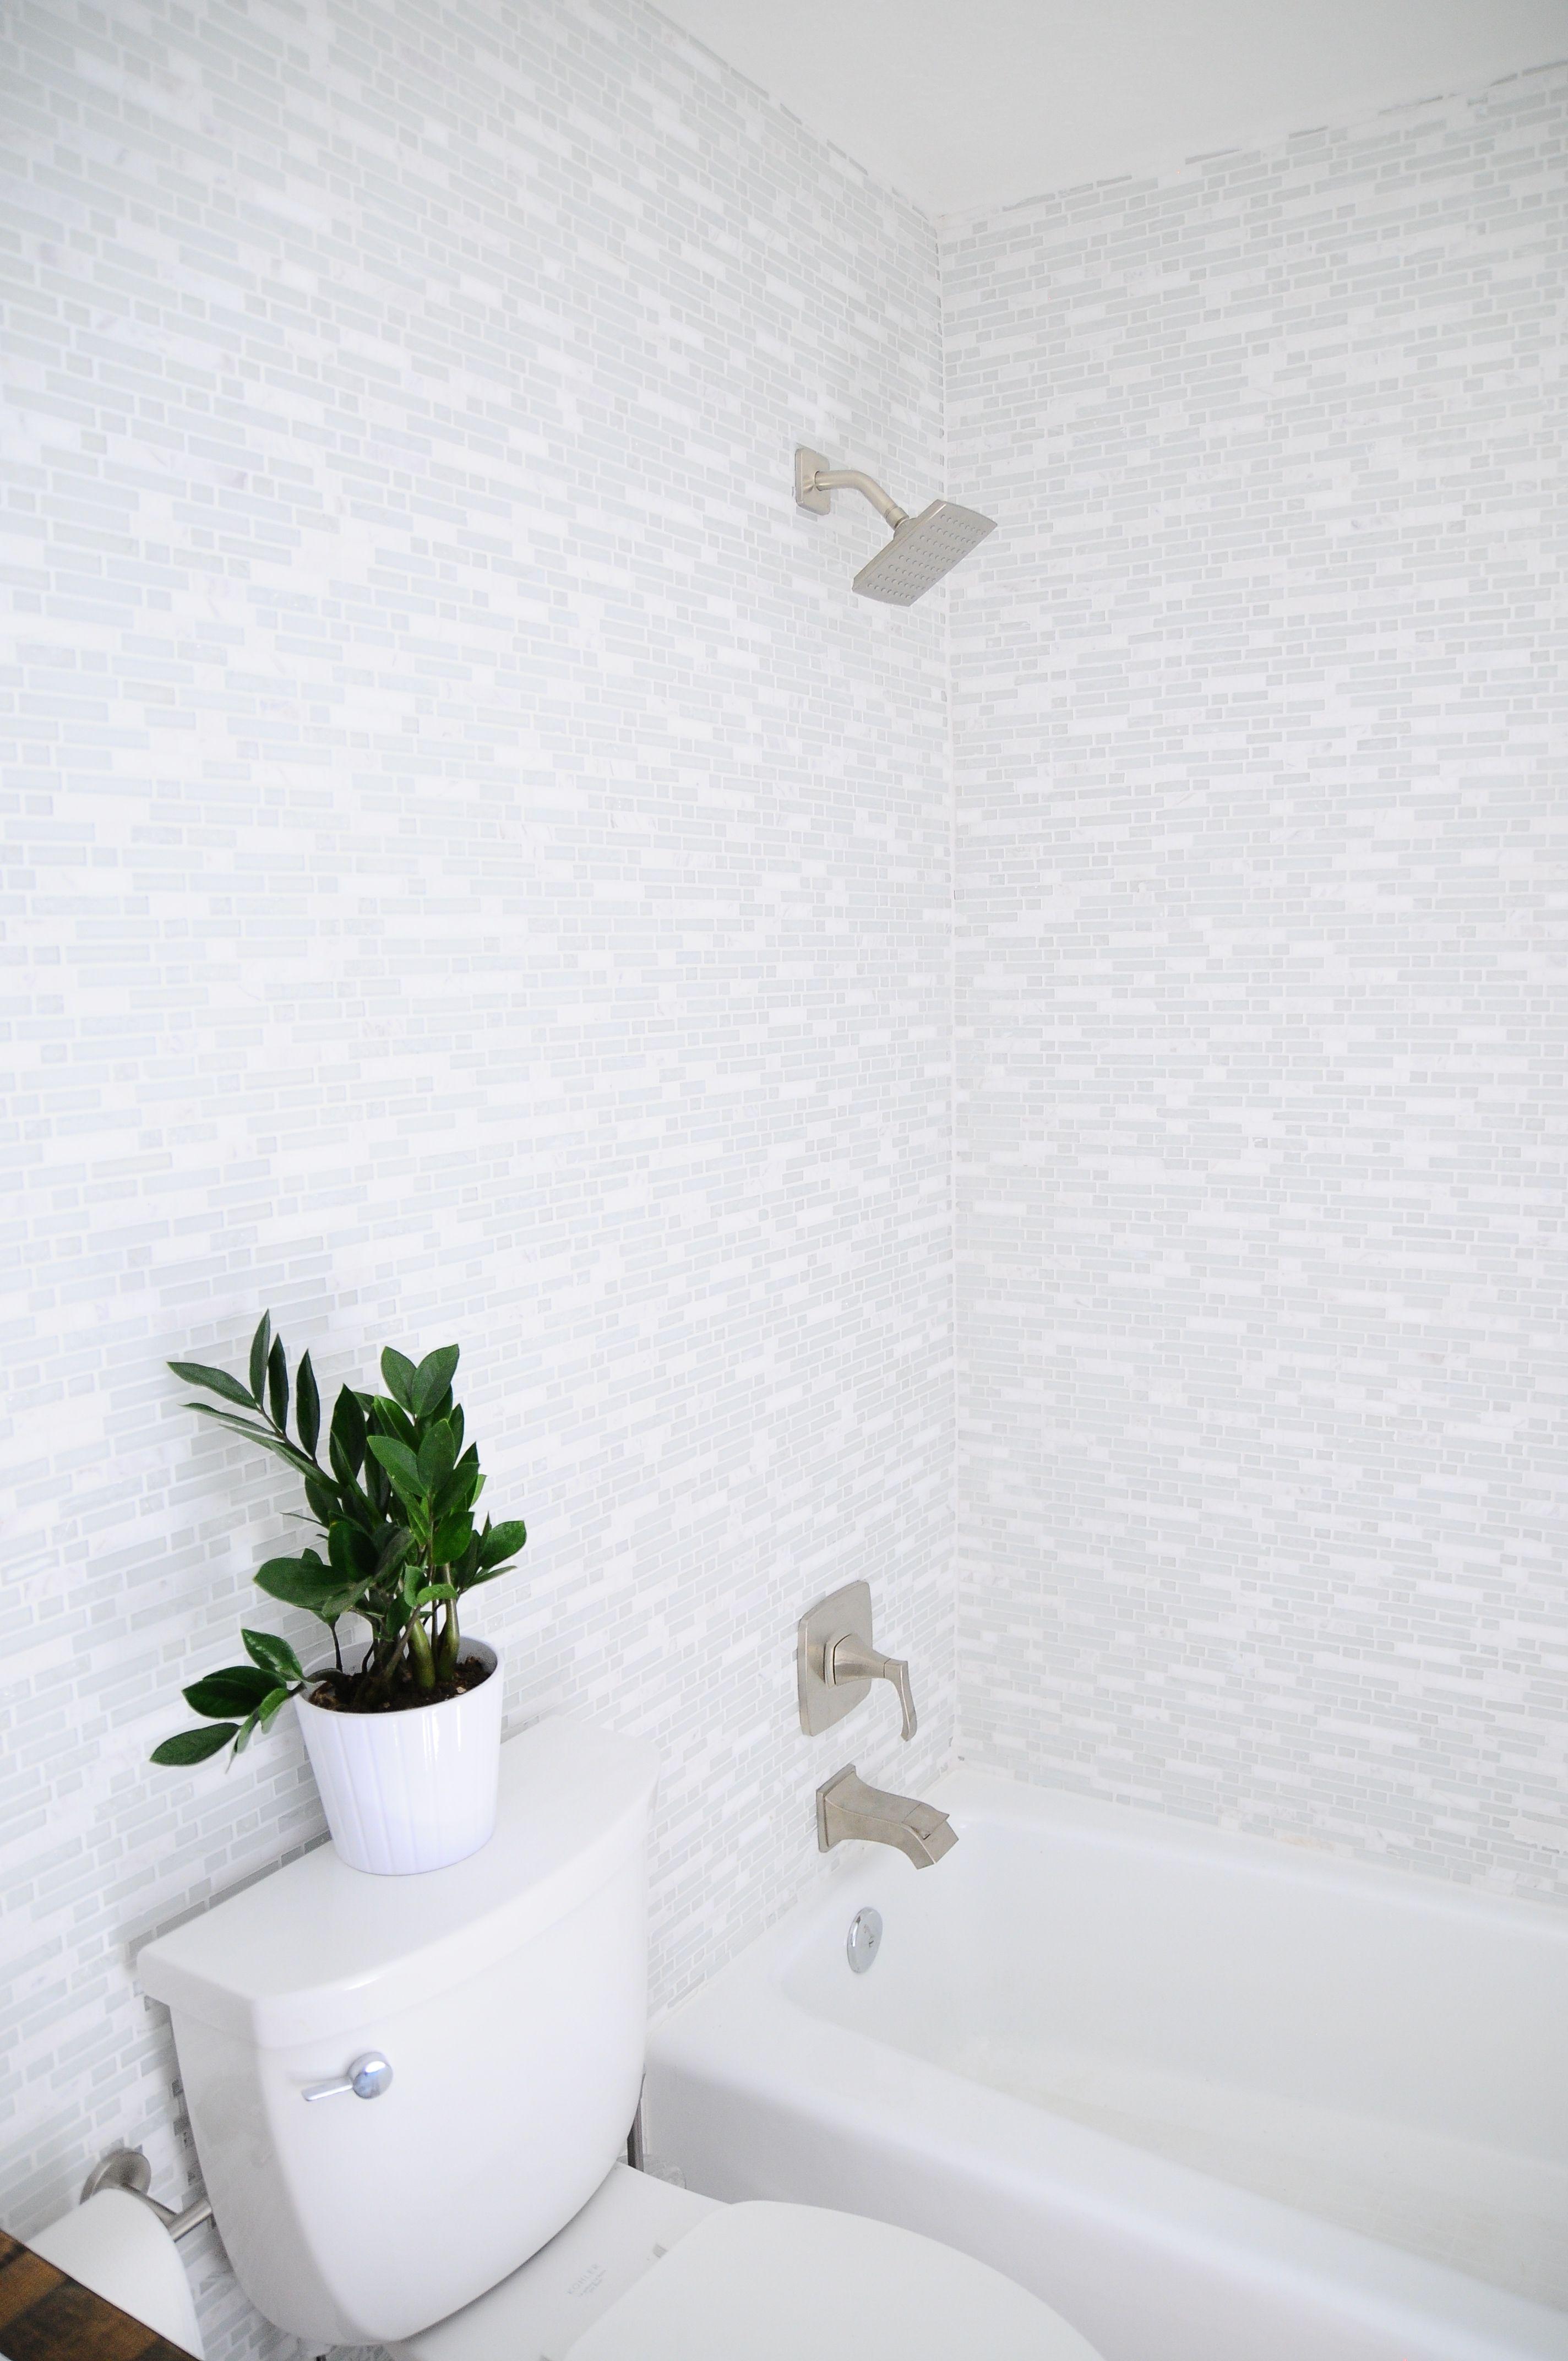 Home Depot Reno Floor To Ceiling Tile Make This Tiny Bath Feel - Bathroom ceiling tiles home depot for bathroom decor ideas